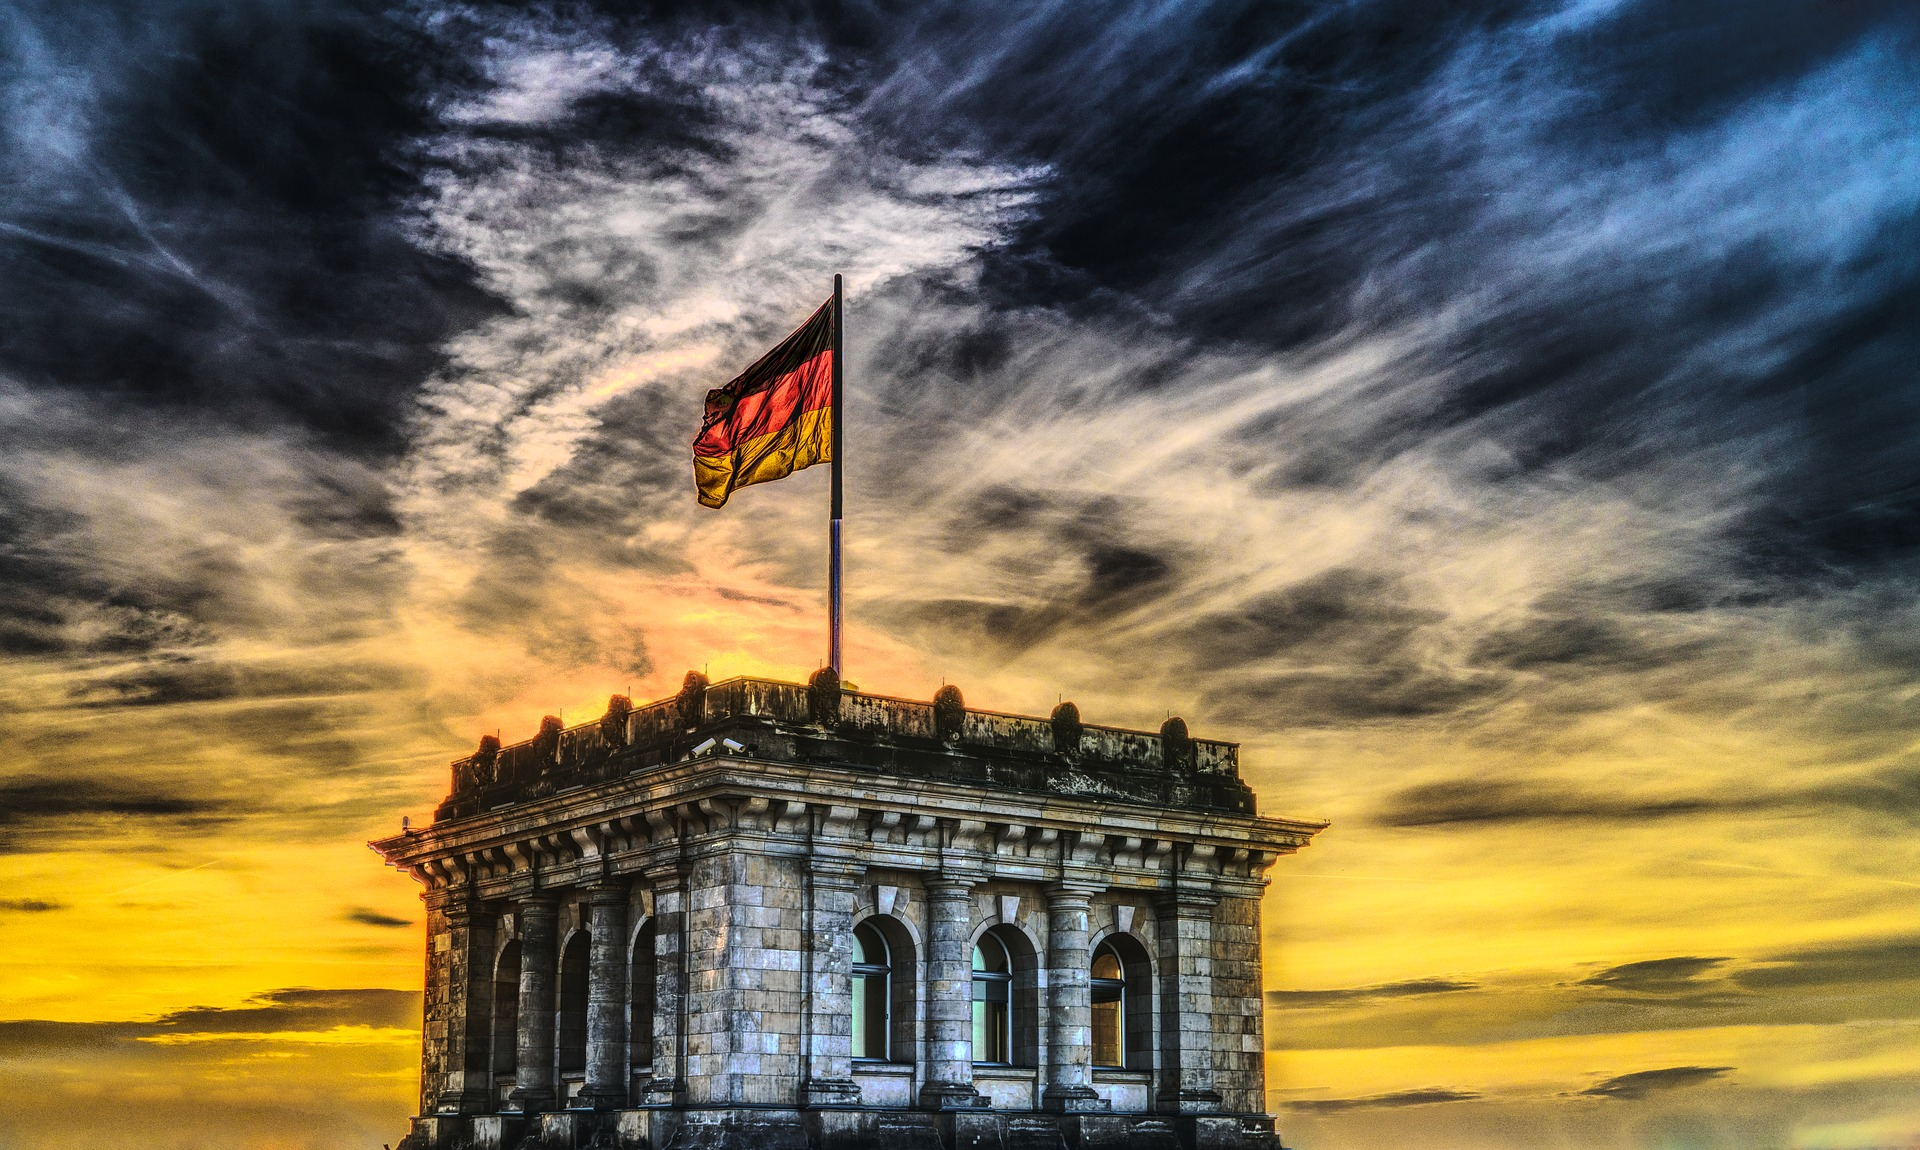 flaga niemiec budestag - Pixabay